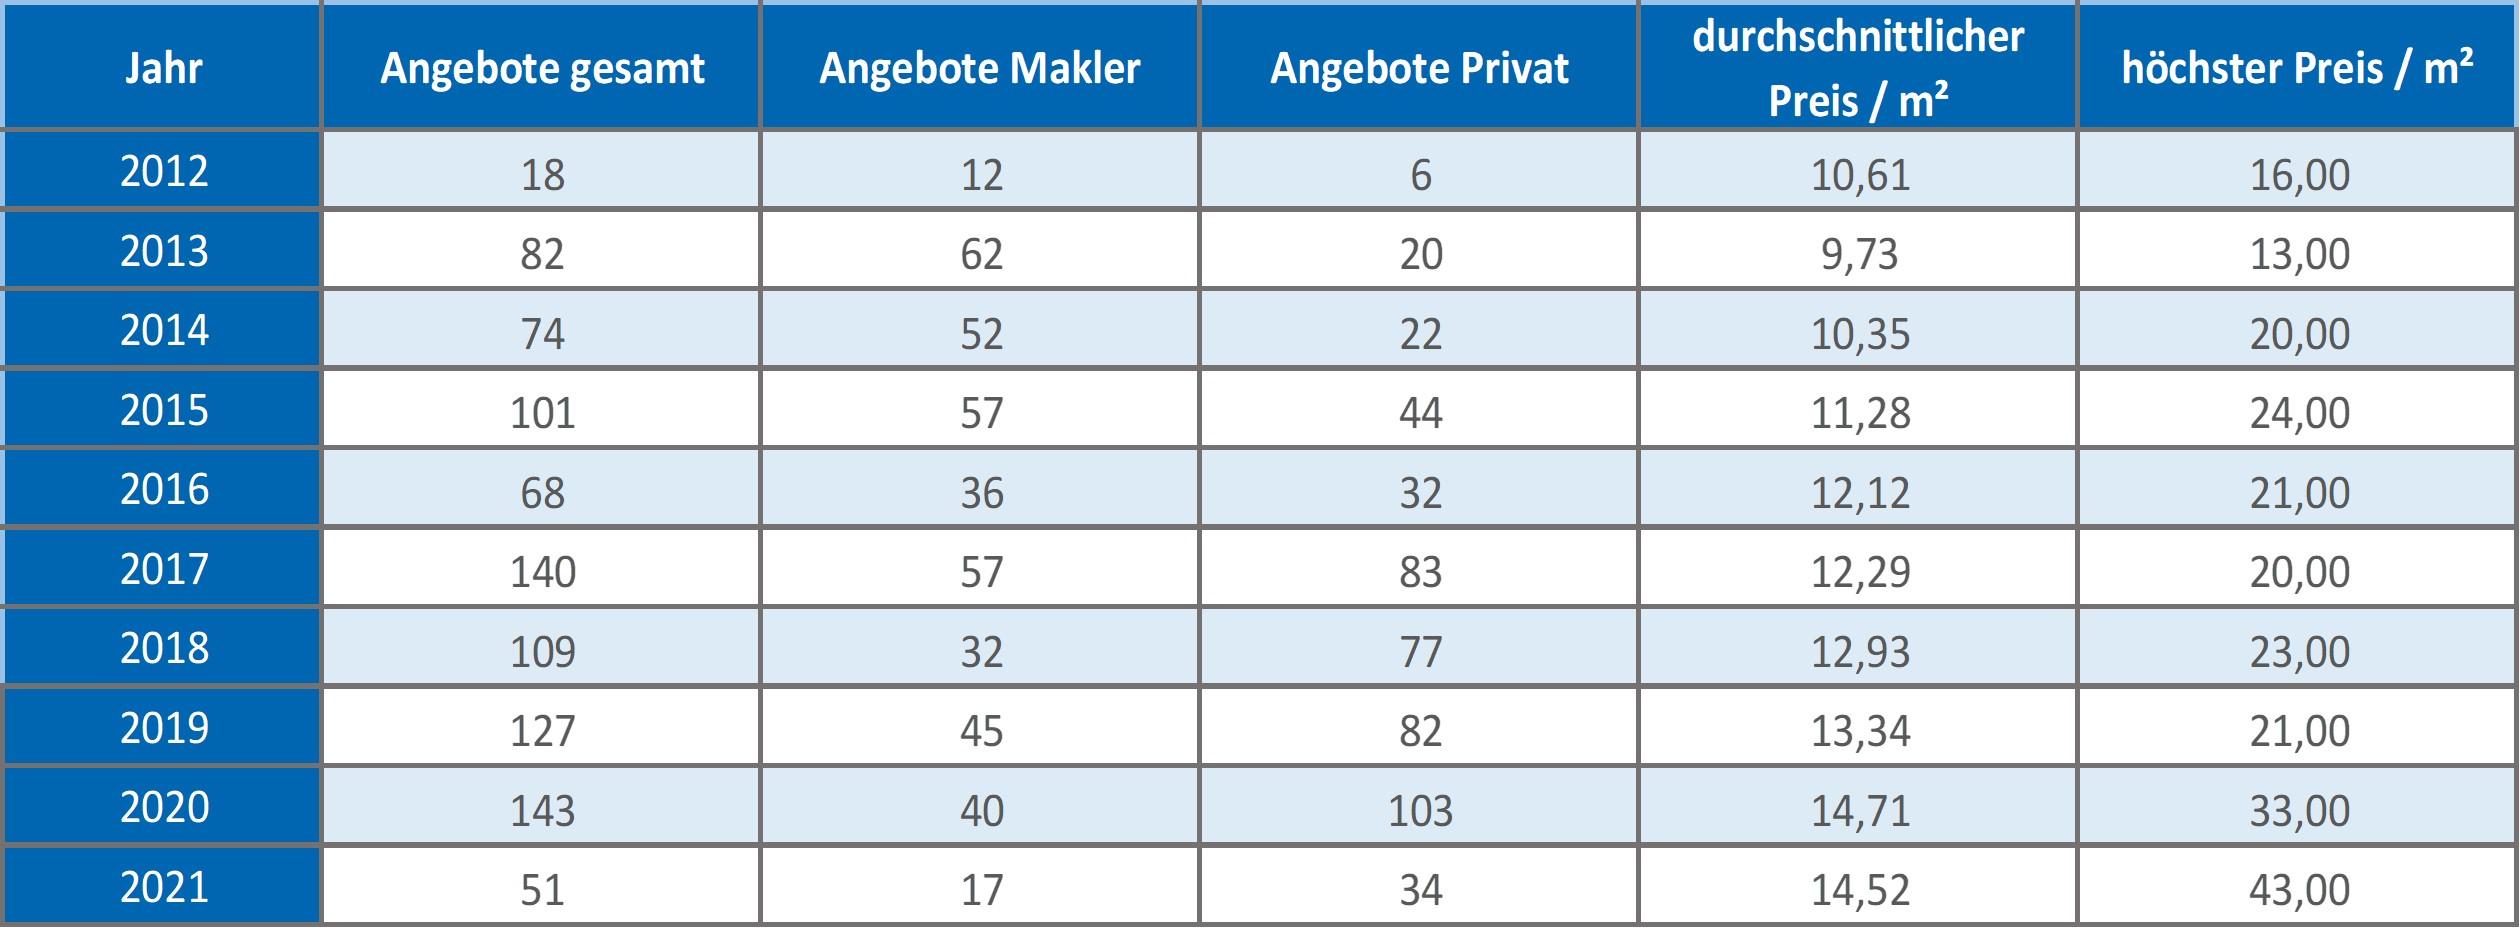 Sauerlach Mieten Vermieten qm-Miete Mietpreis Preis Bewertung Makler  2019 2020 2021 www.happy-immo.de